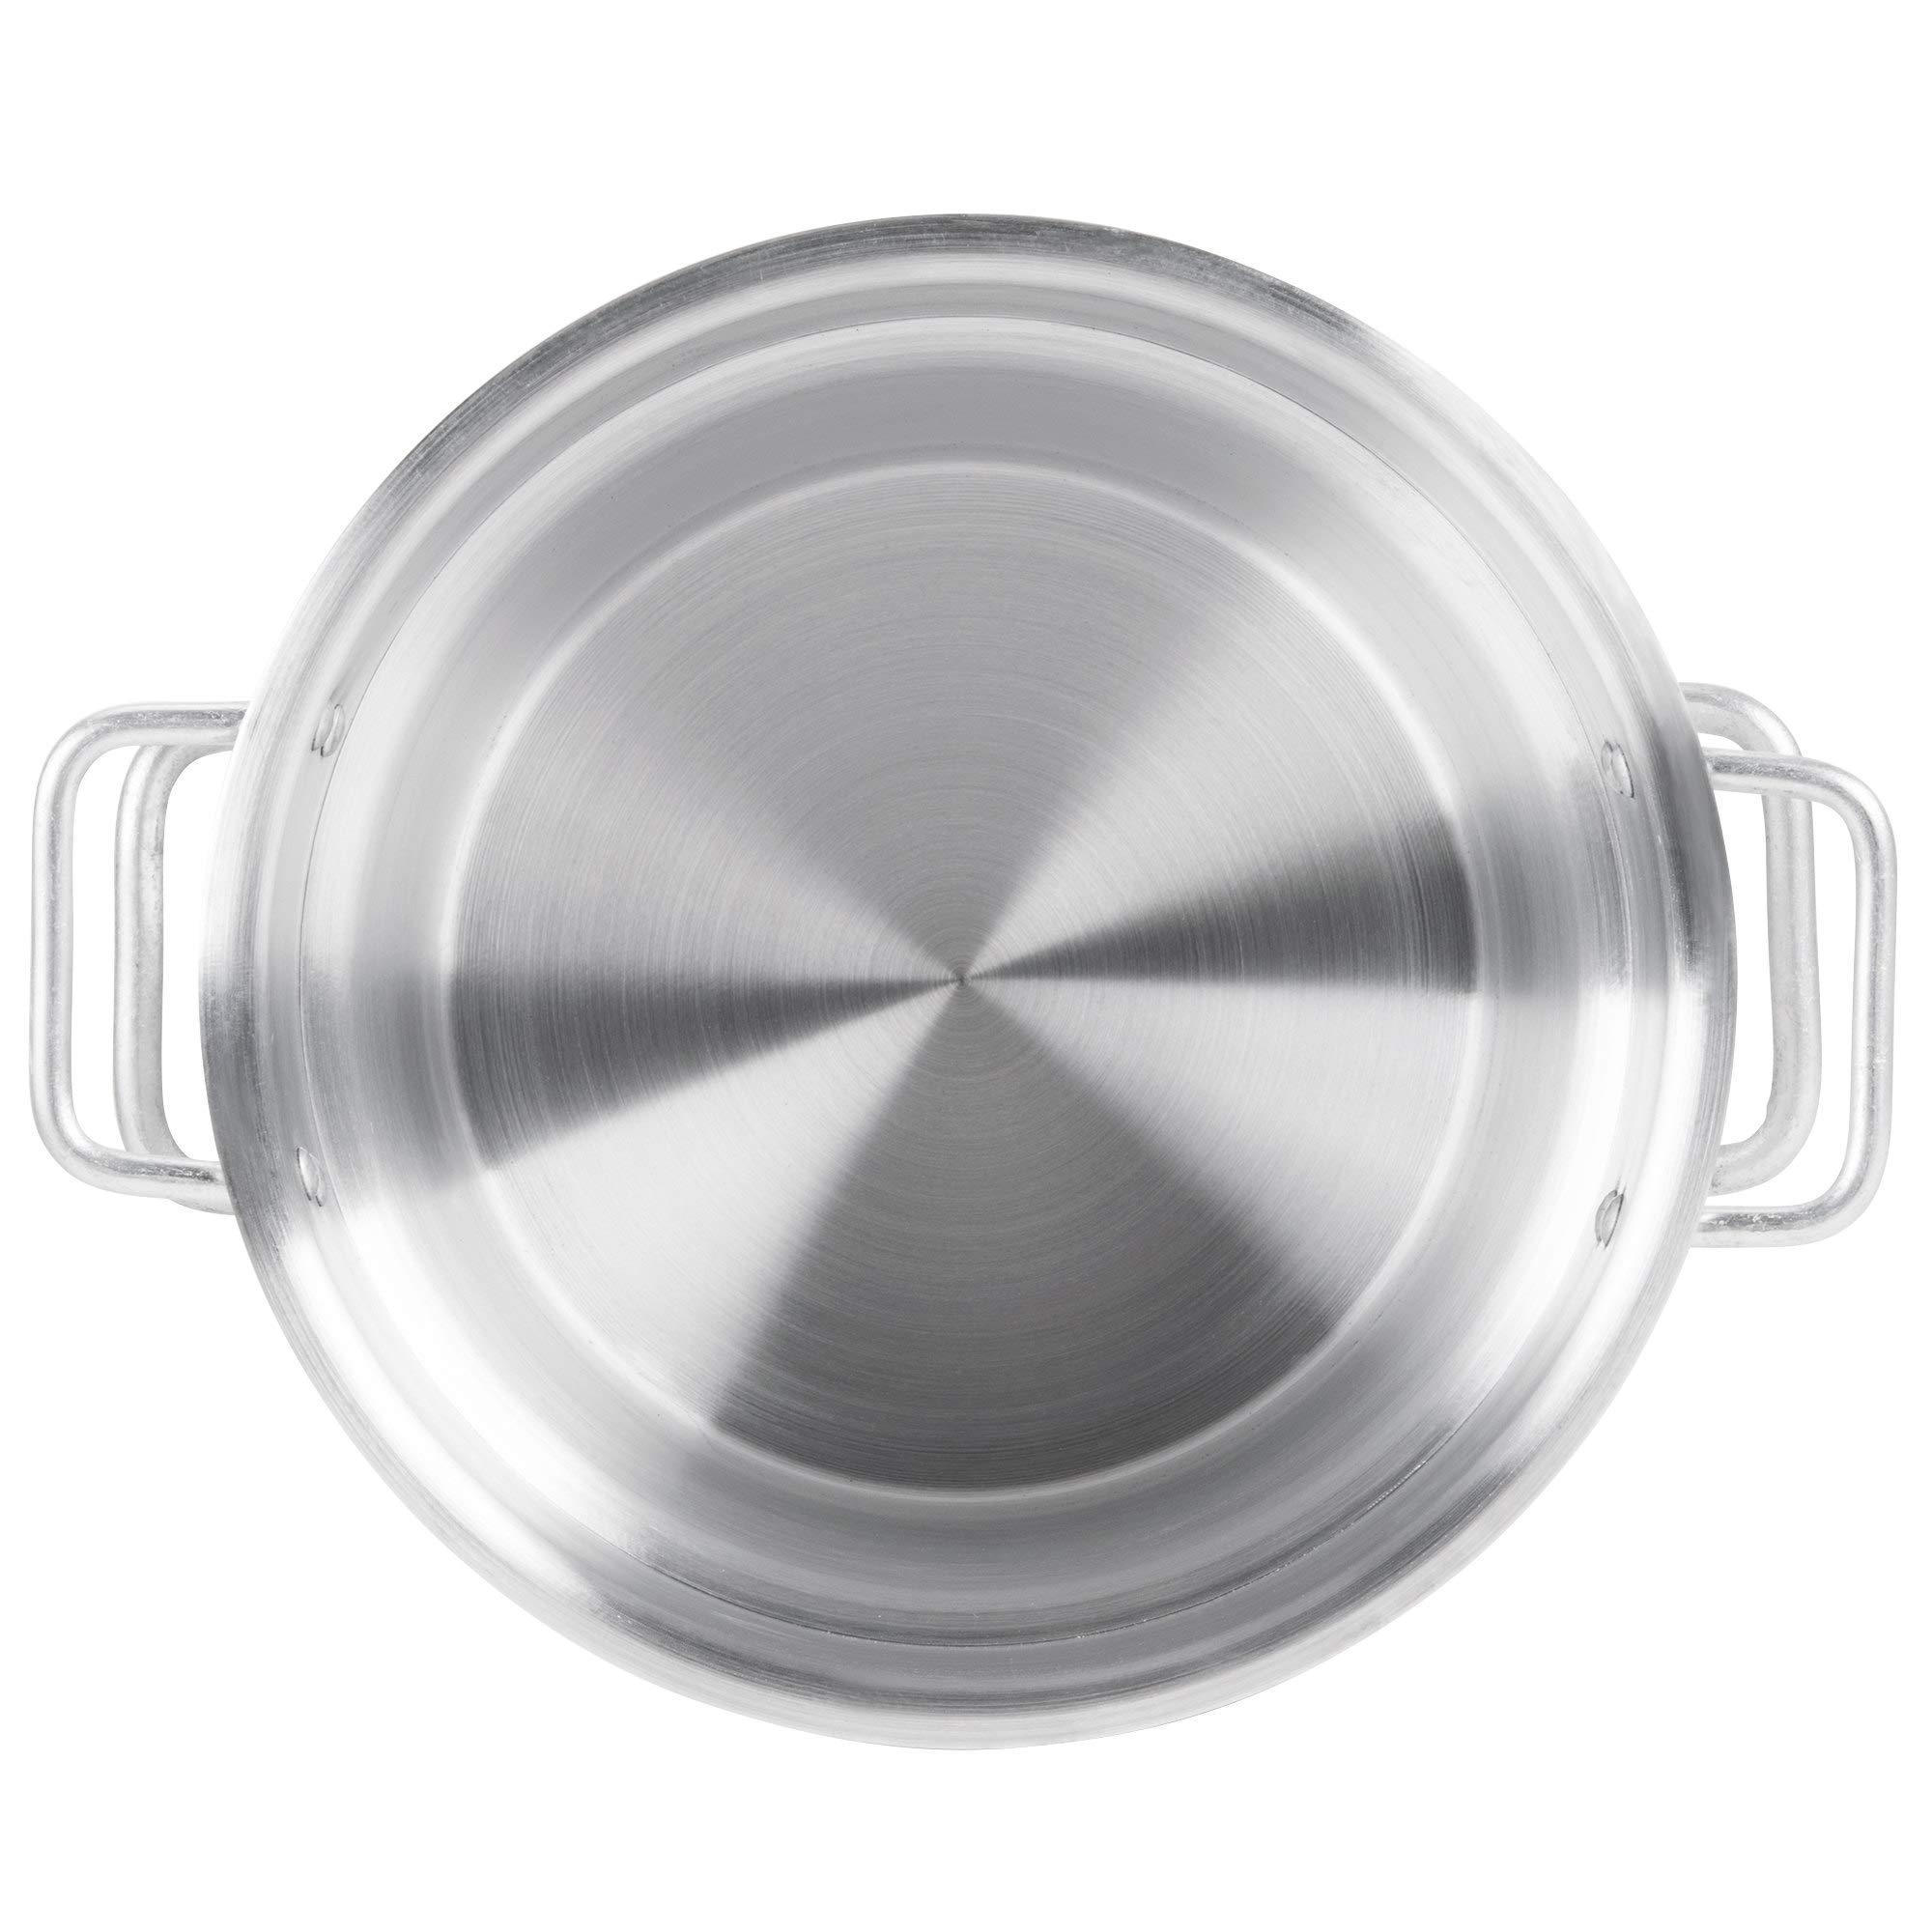 Aluminum Double Boiler